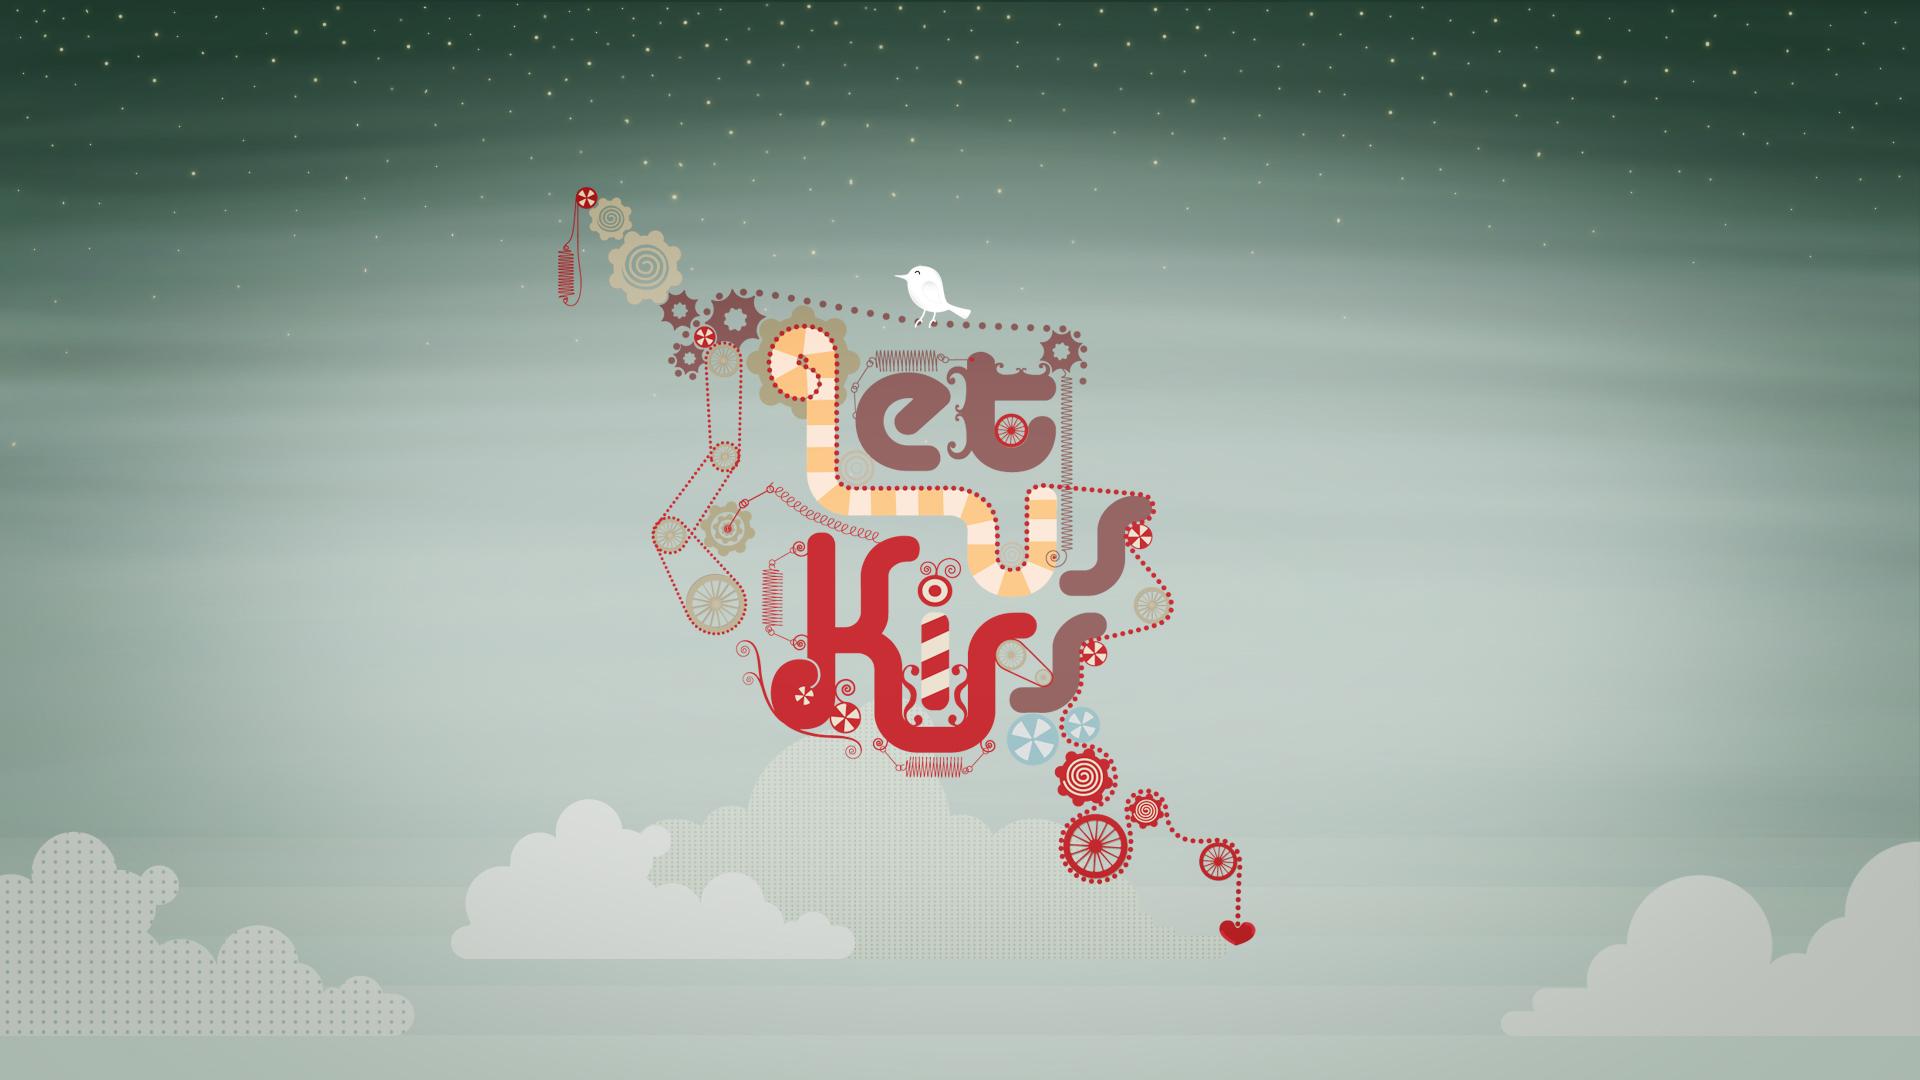 ferris_wheel_logo.jpg